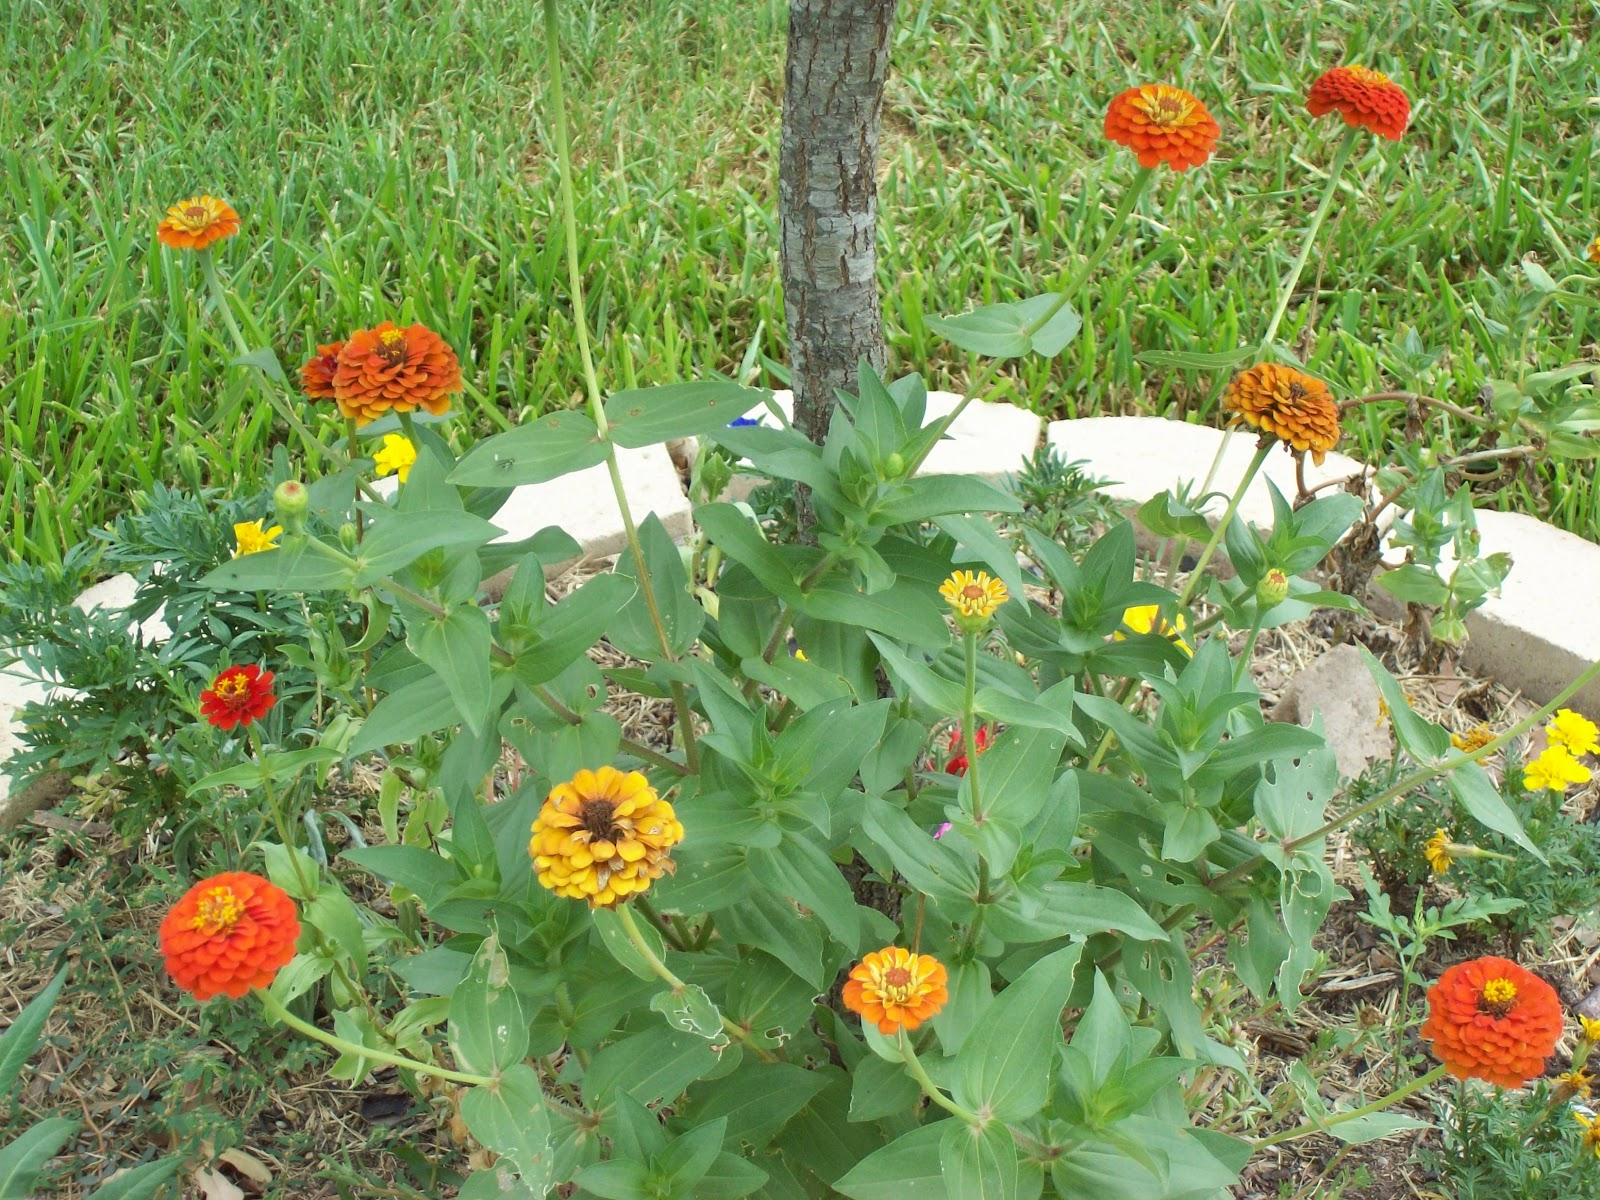 Gardening 2009 - 101_4967.JPG